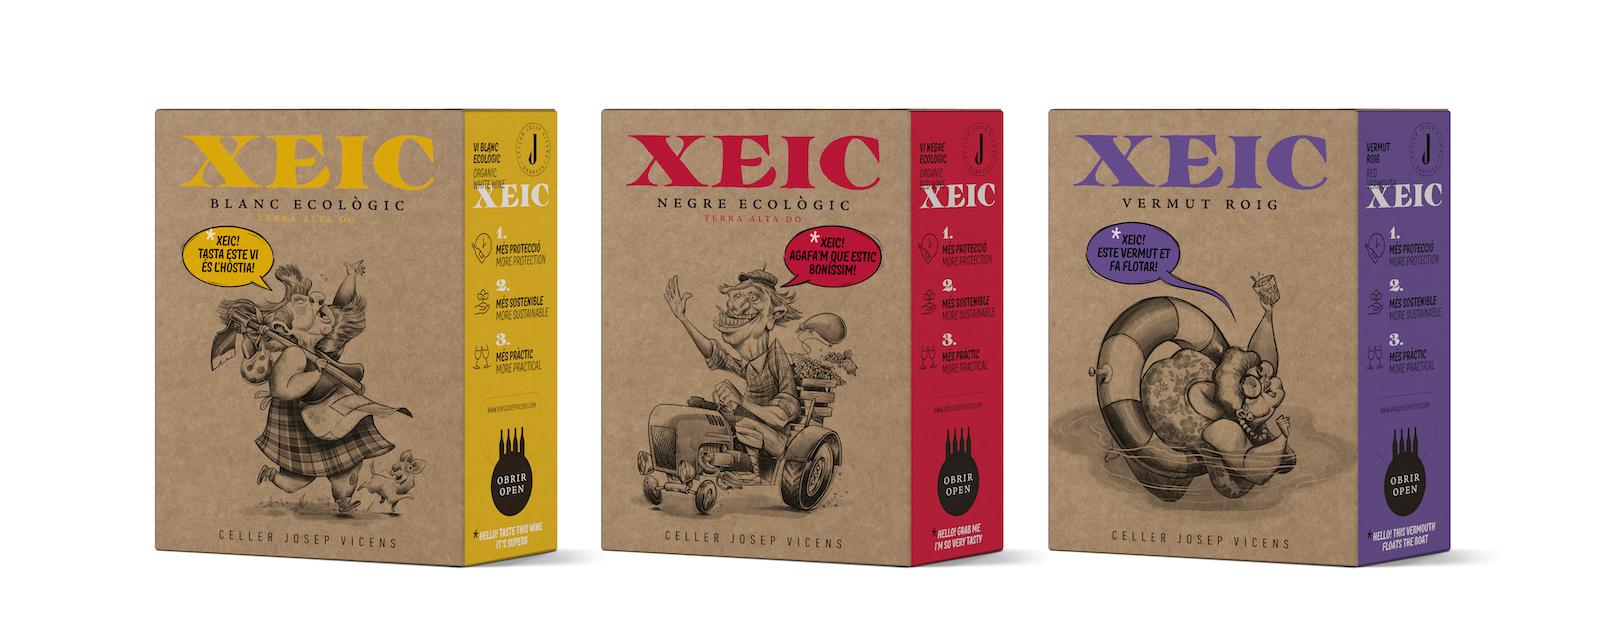 Xeic, Bag in Box del celler Josep Vicens de Gandesa